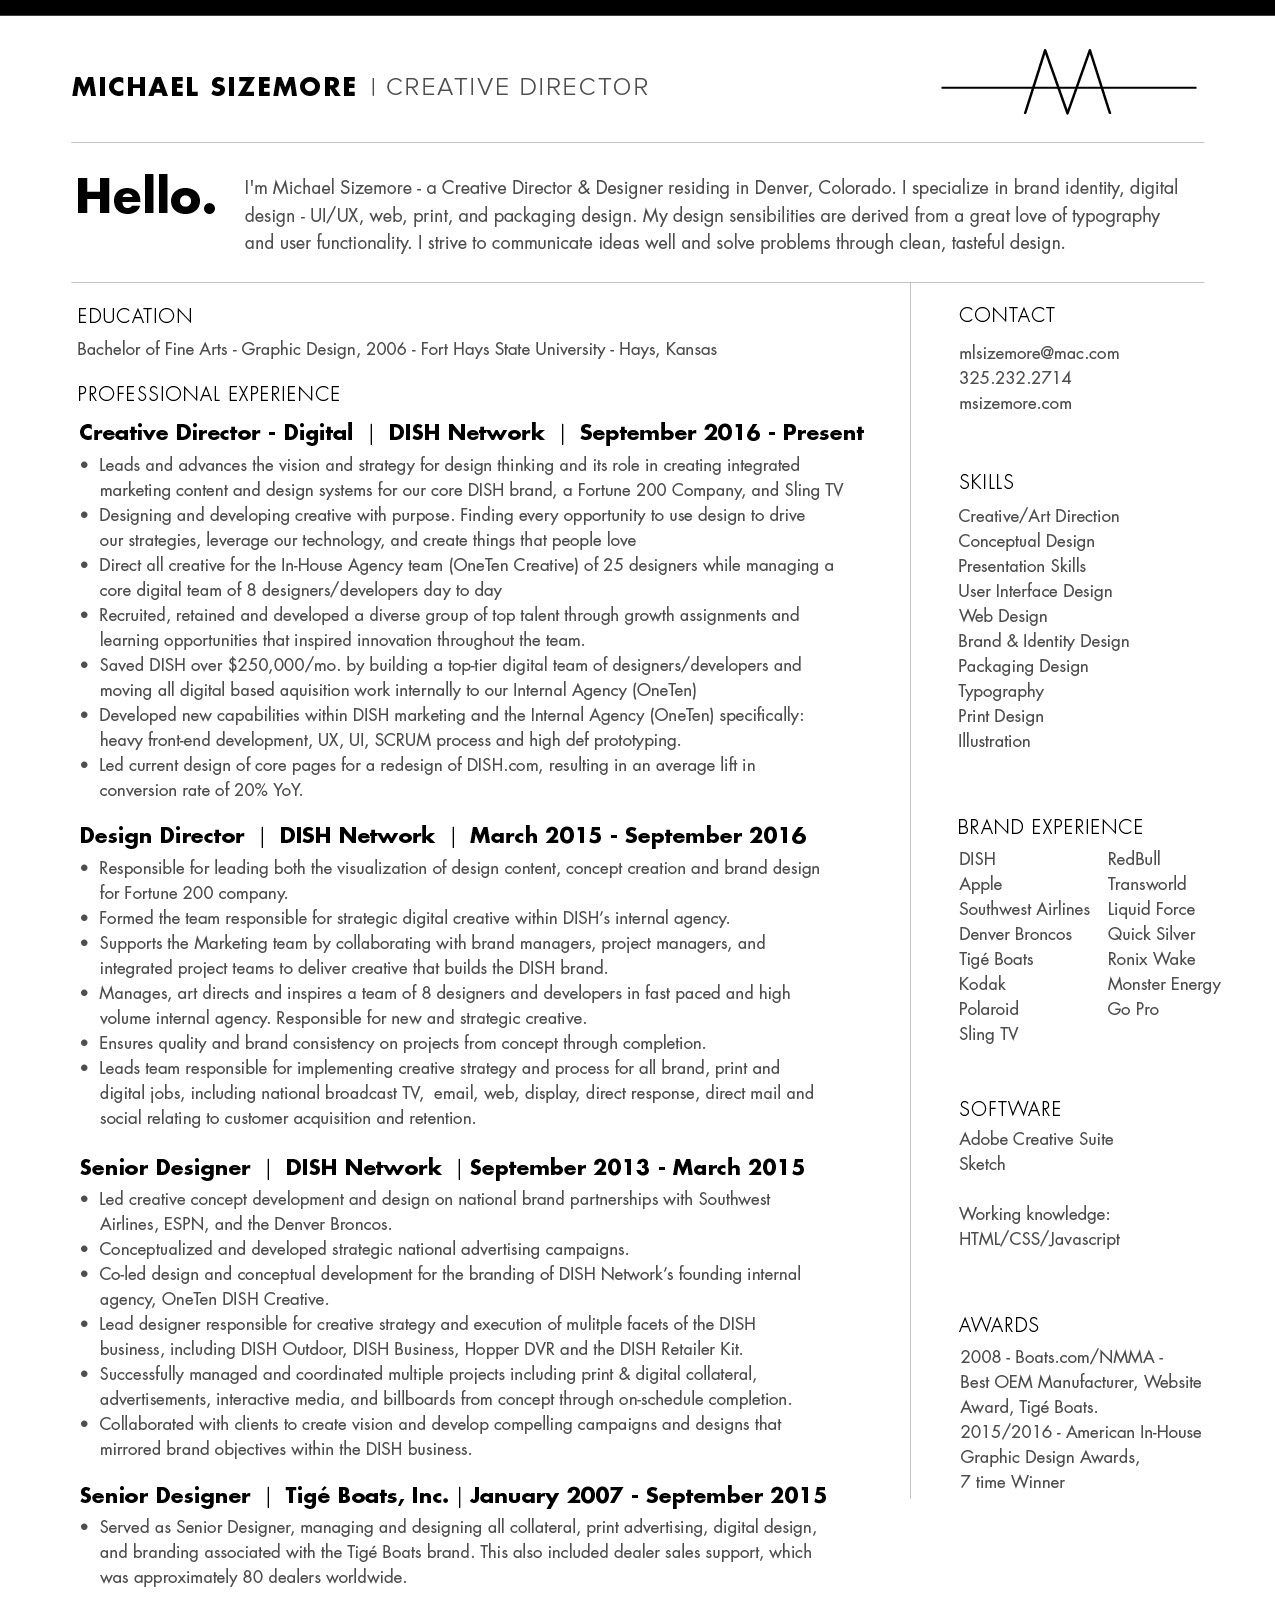 Michael Sizemore - Creative/Art Director - Resume